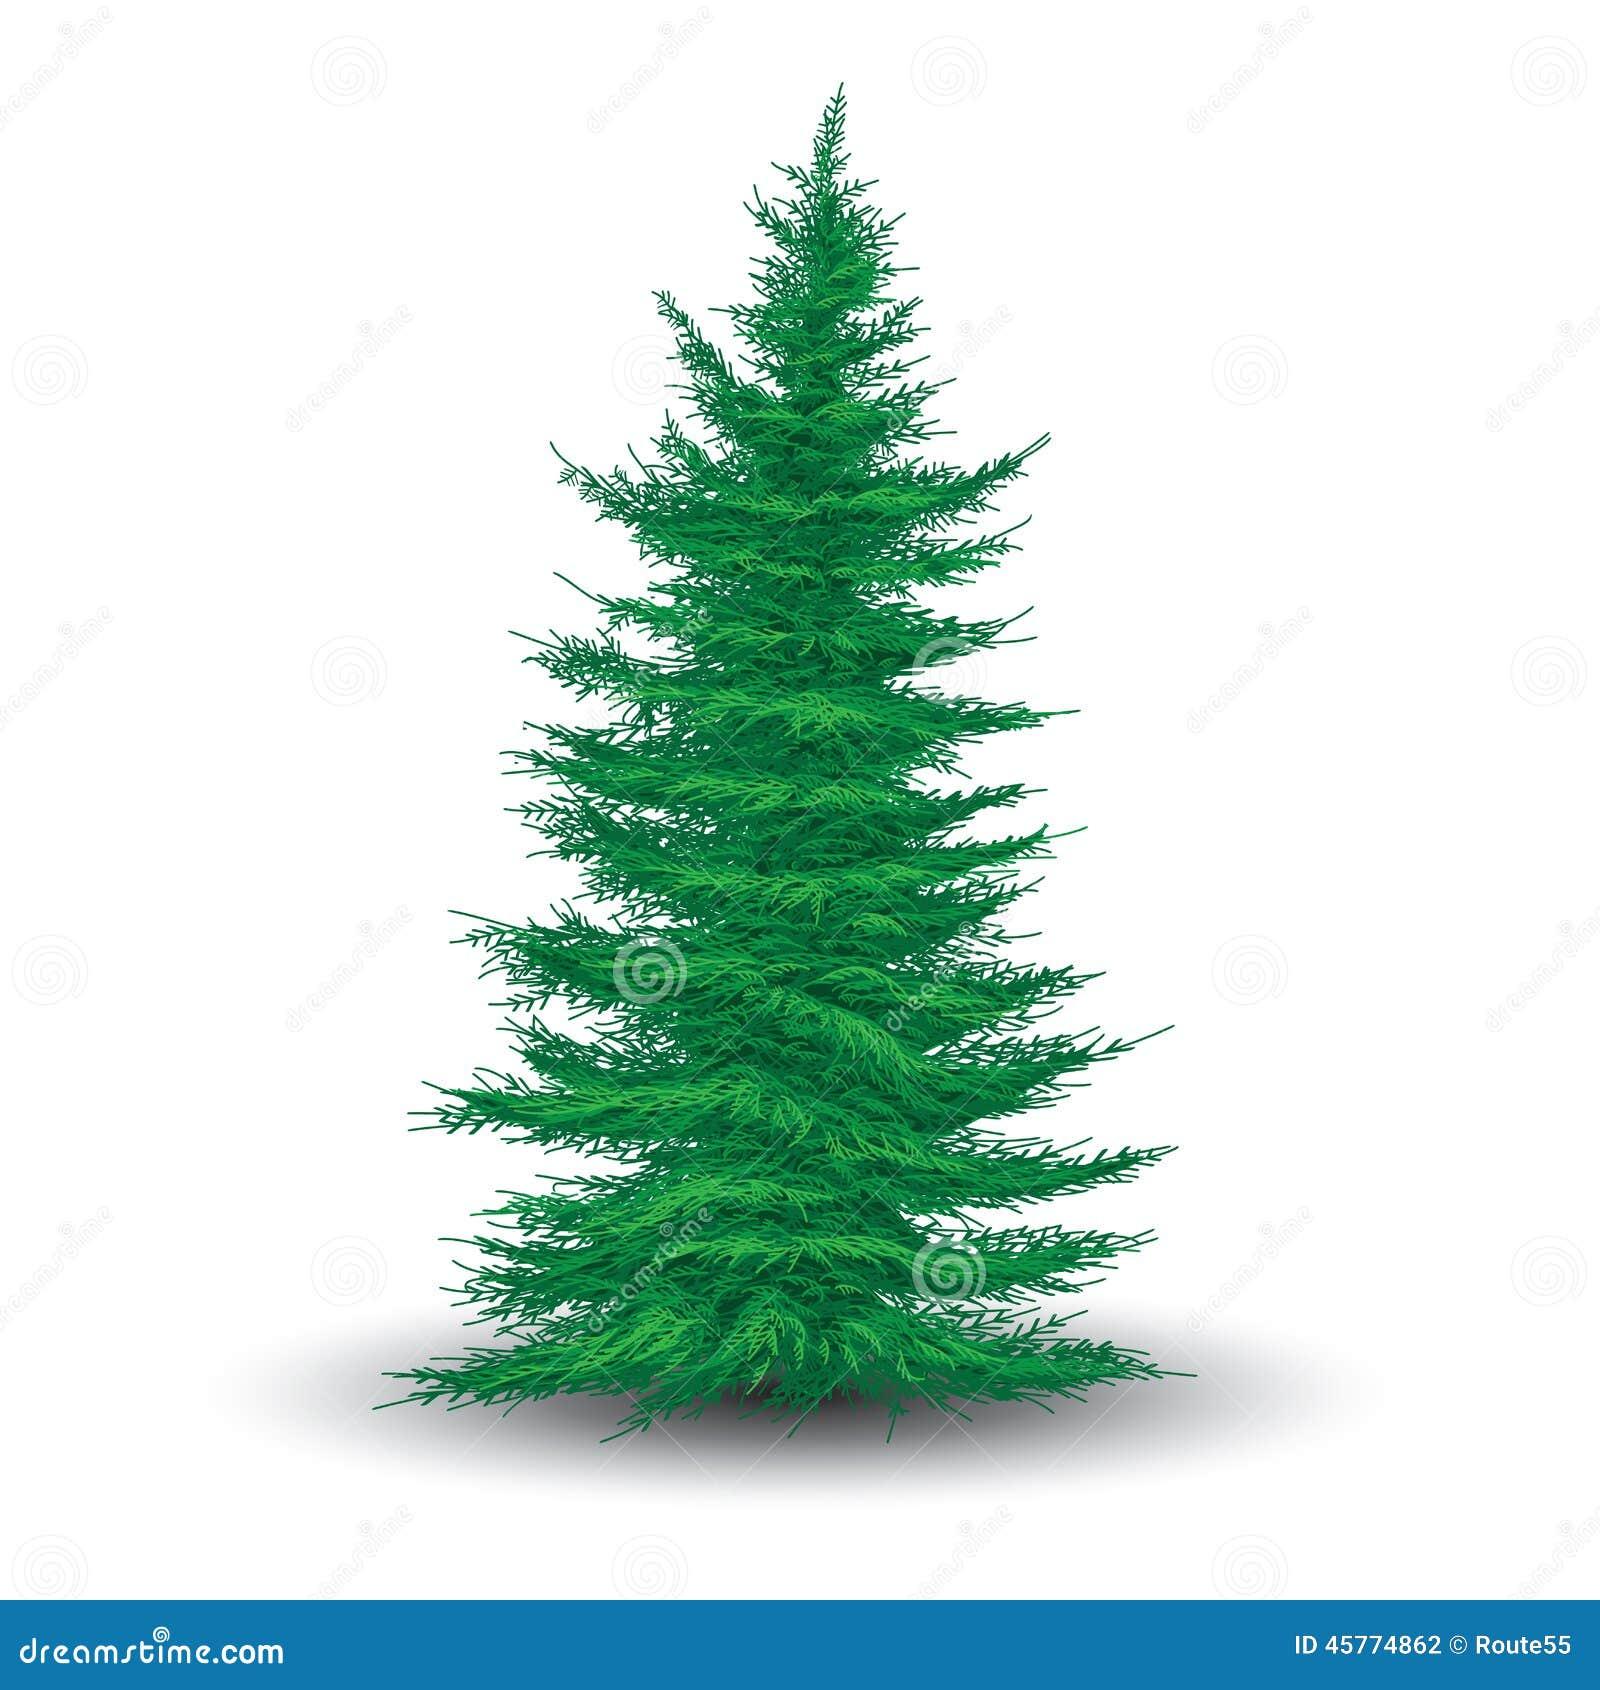 arbre de sapin vert illustration de vecteur image 45774862. Black Bedroom Furniture Sets. Home Design Ideas